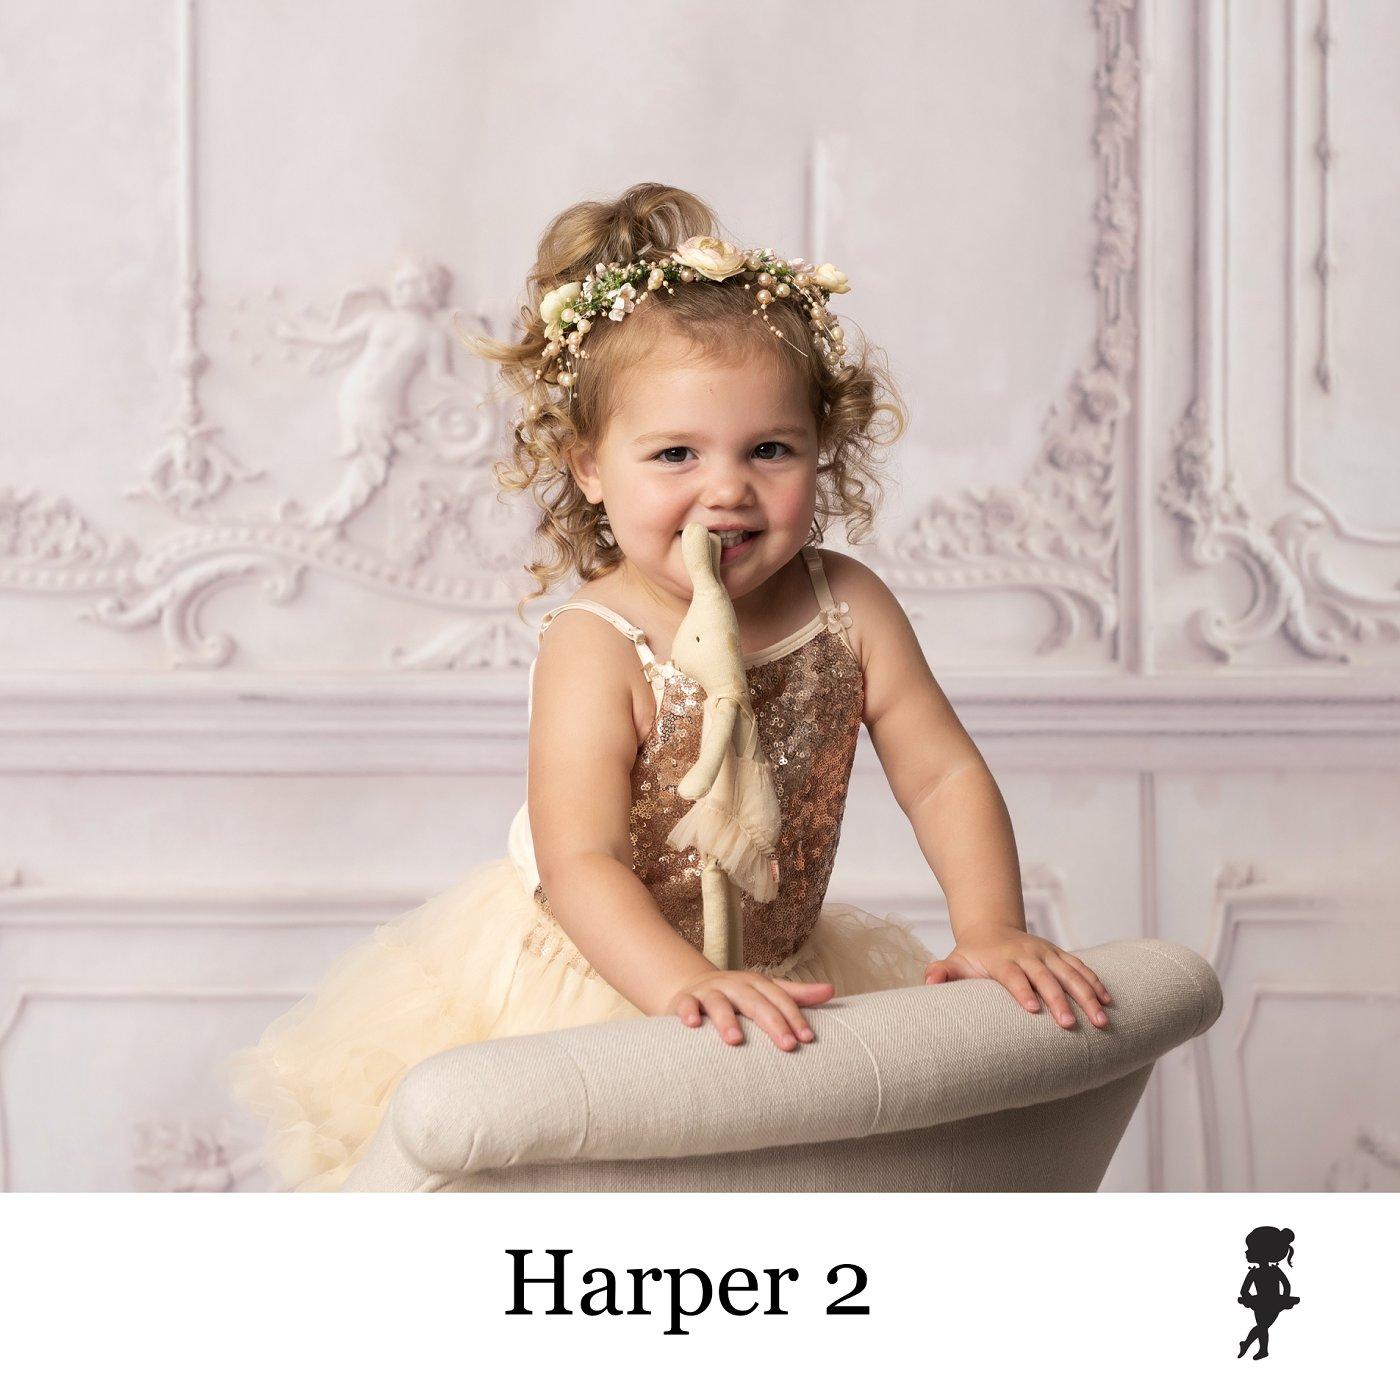 LB11019-Harper 2.jpg